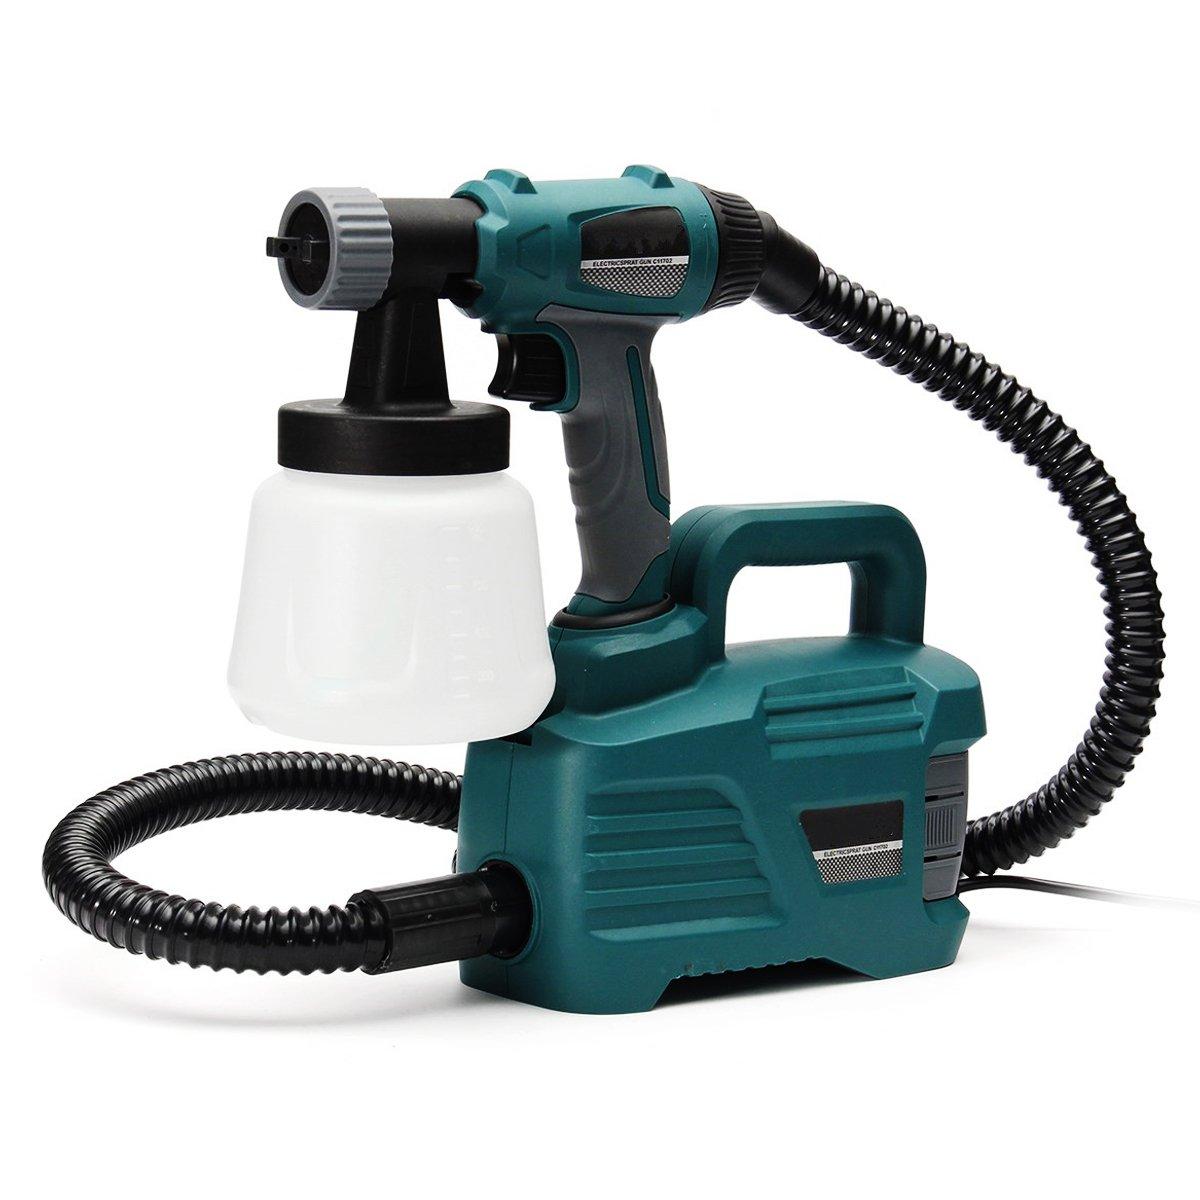 800W 900ML Electric Painter Gun Spray Latex Paint Sprayer House Painting Machine by Ologymart (Image #2)